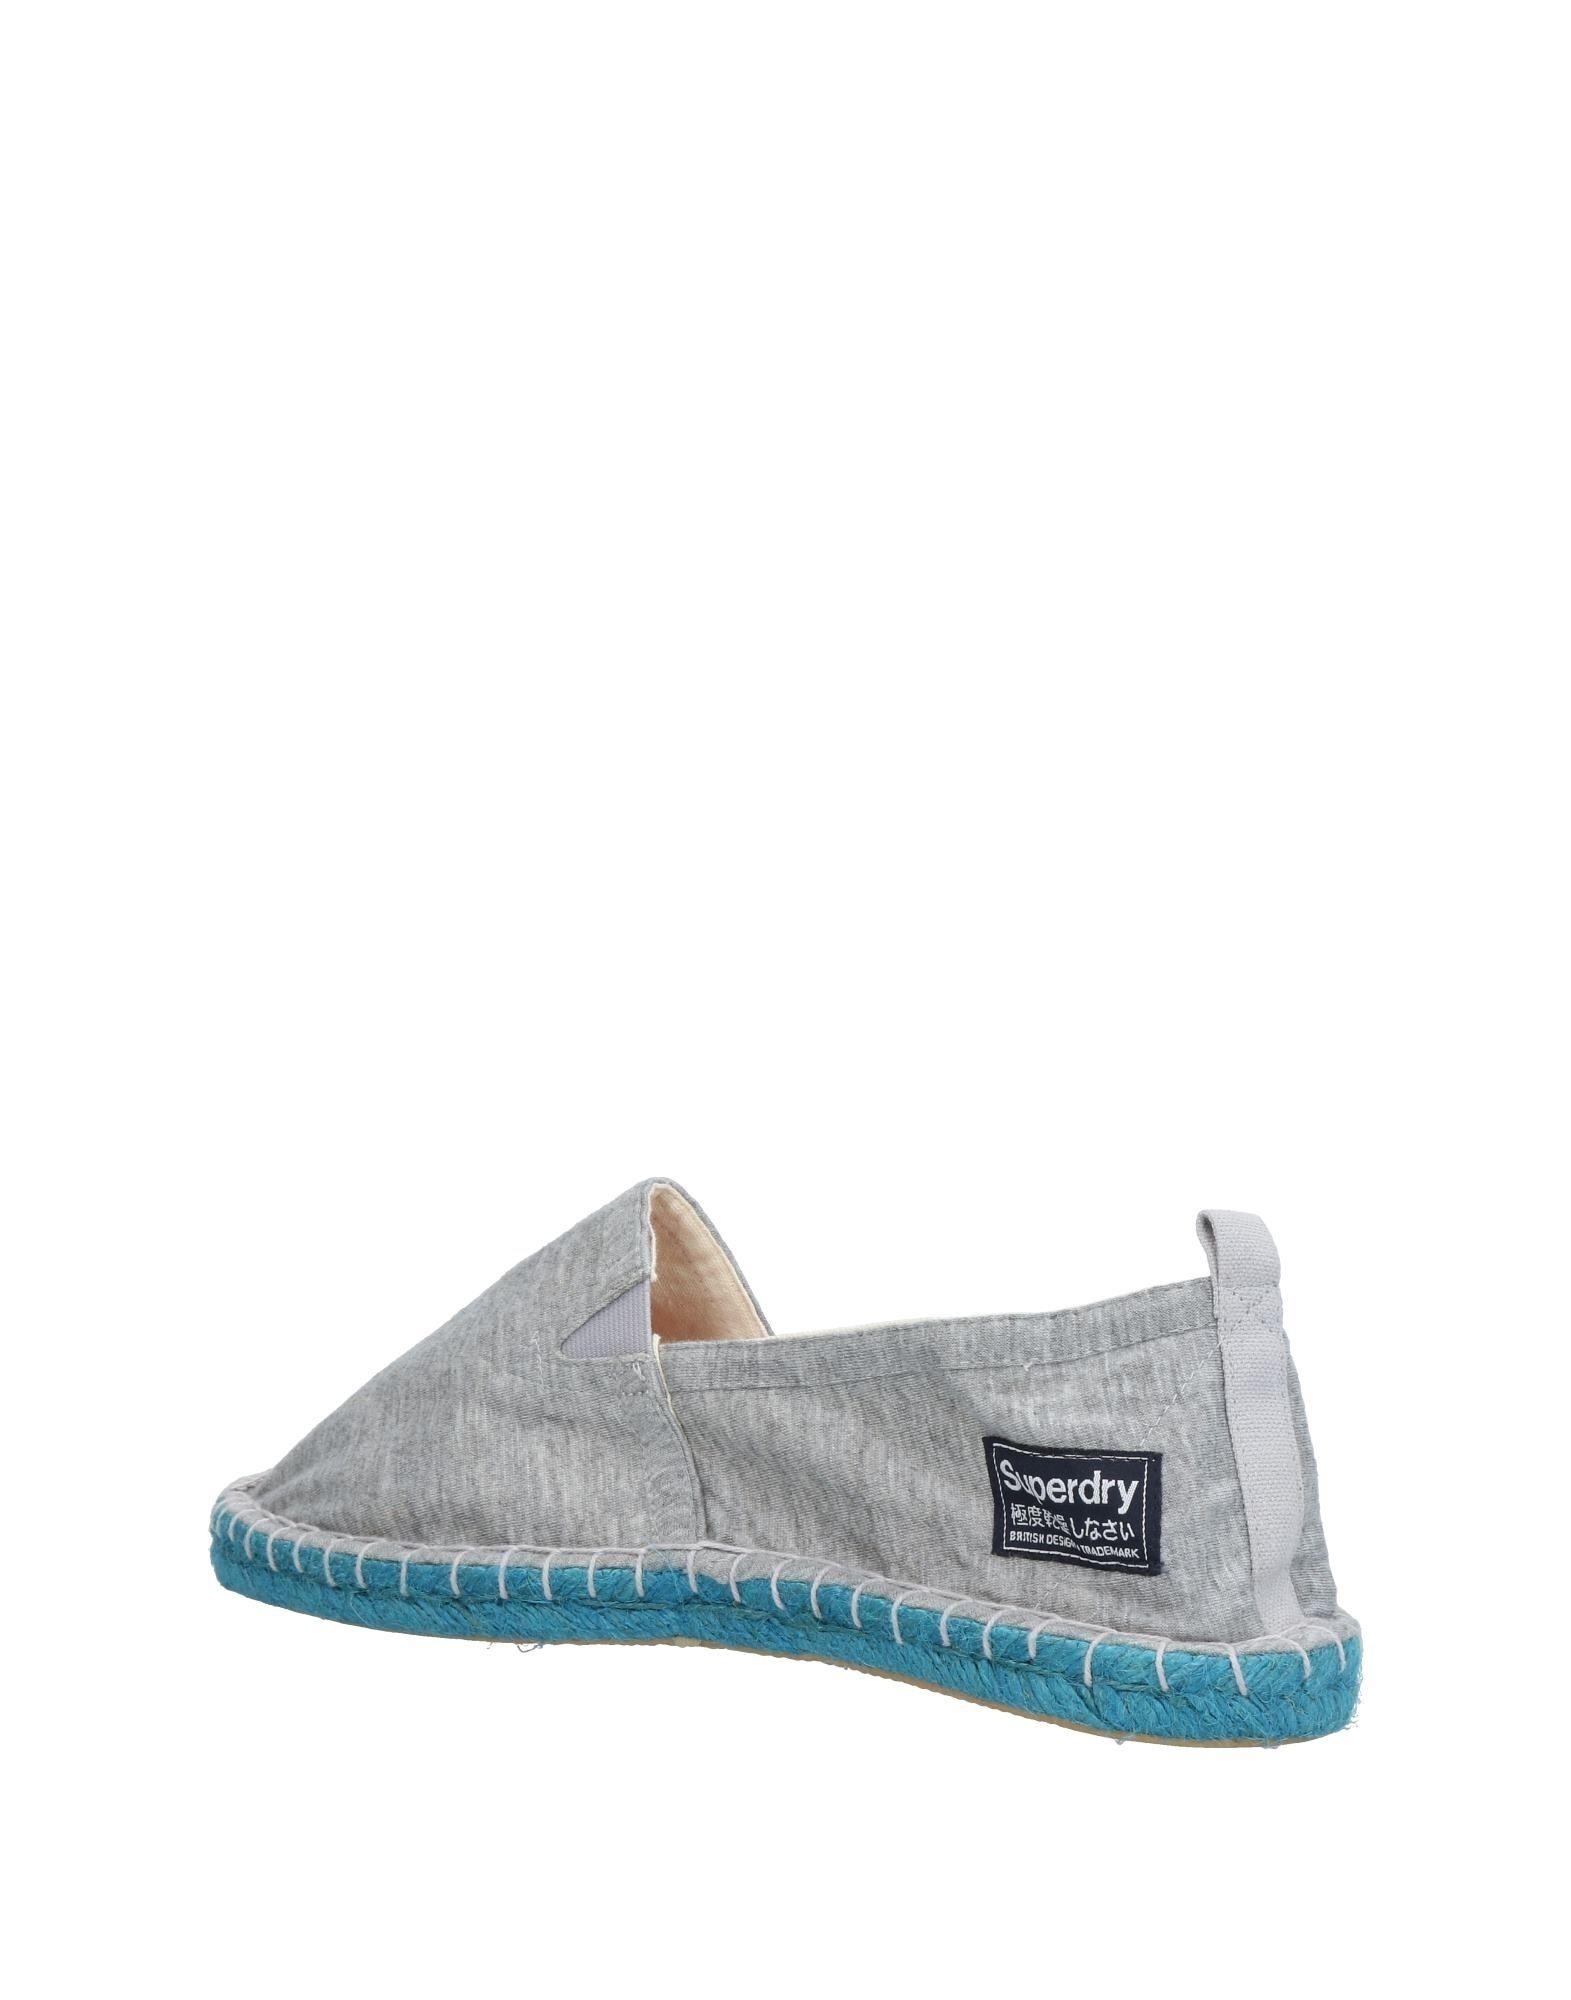 Superdry Schuhe Espadrilles Herren  11438848NL Heiße Schuhe Superdry e6d95f